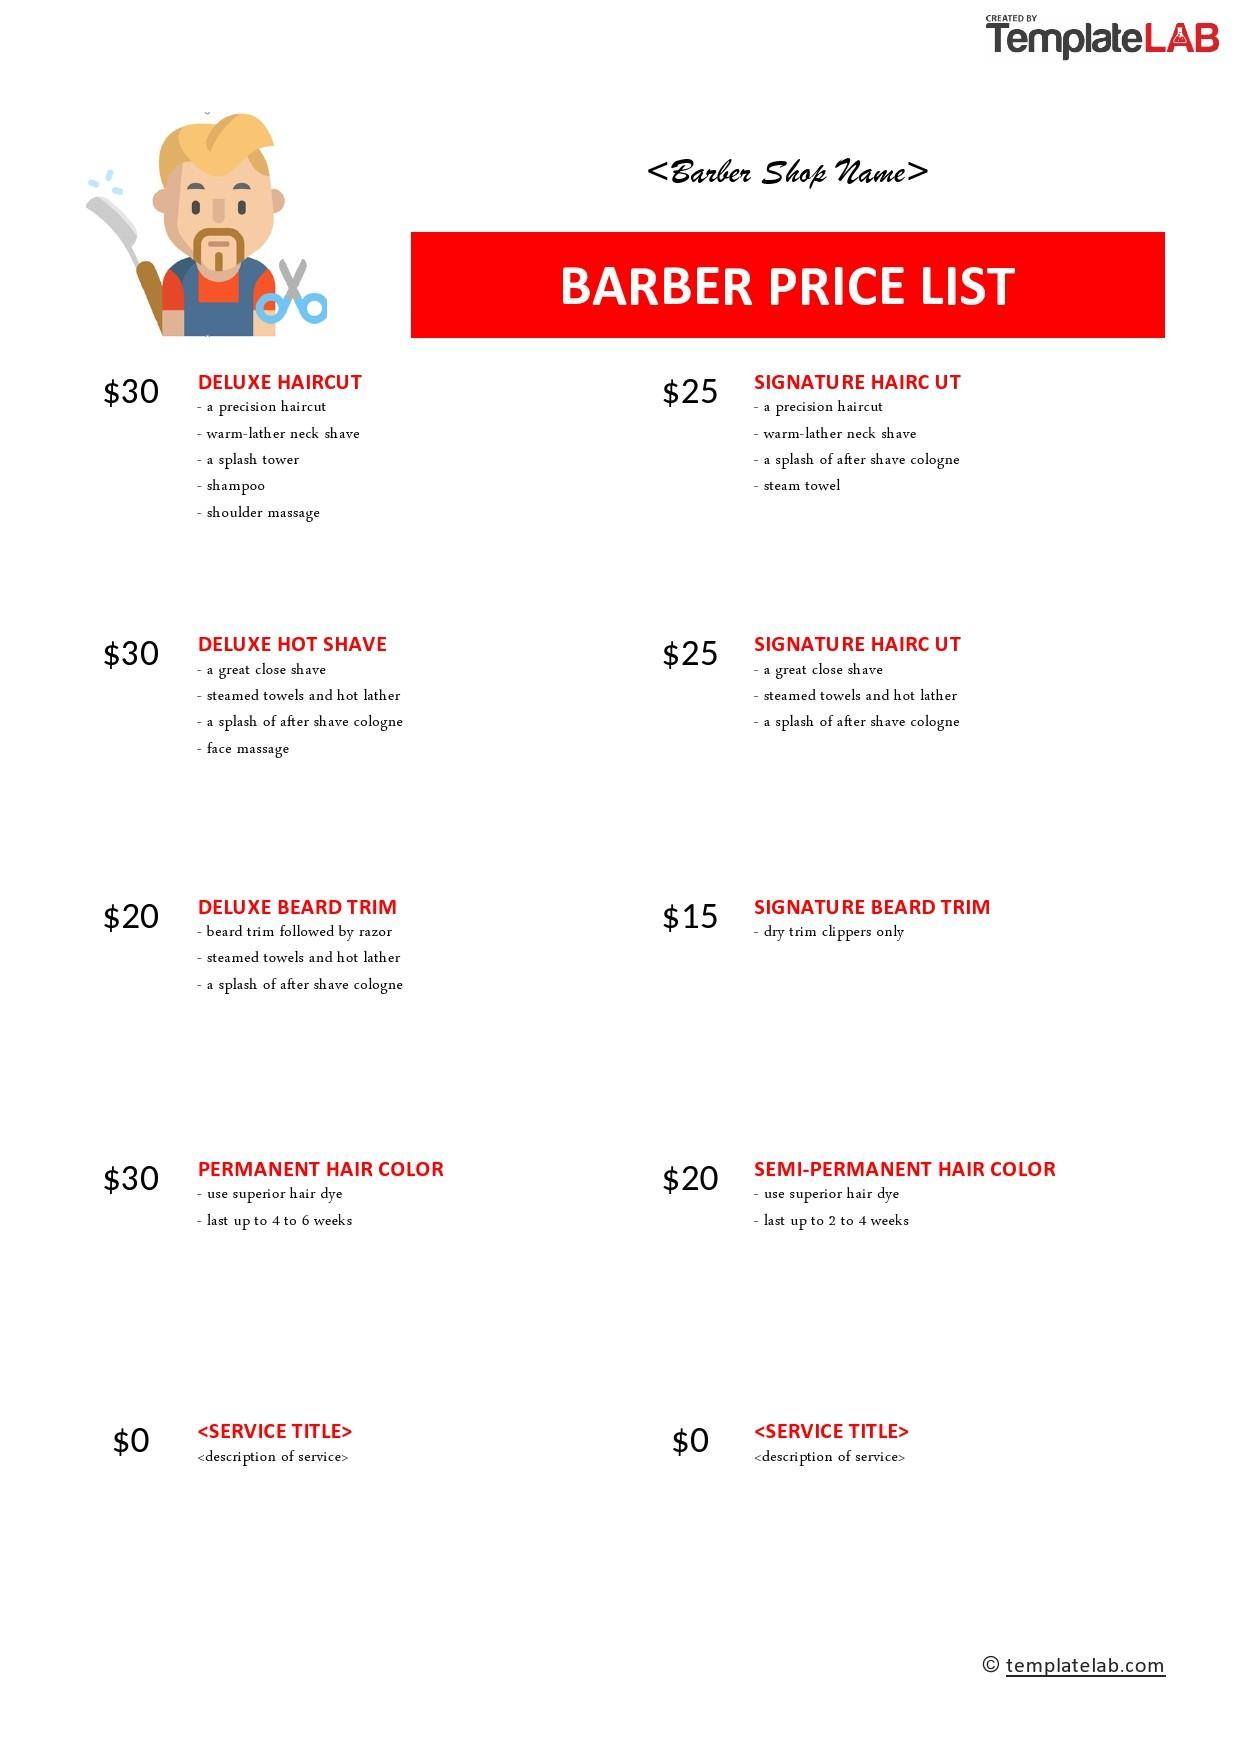 Free Barber Price List Tempate - TemplateLab